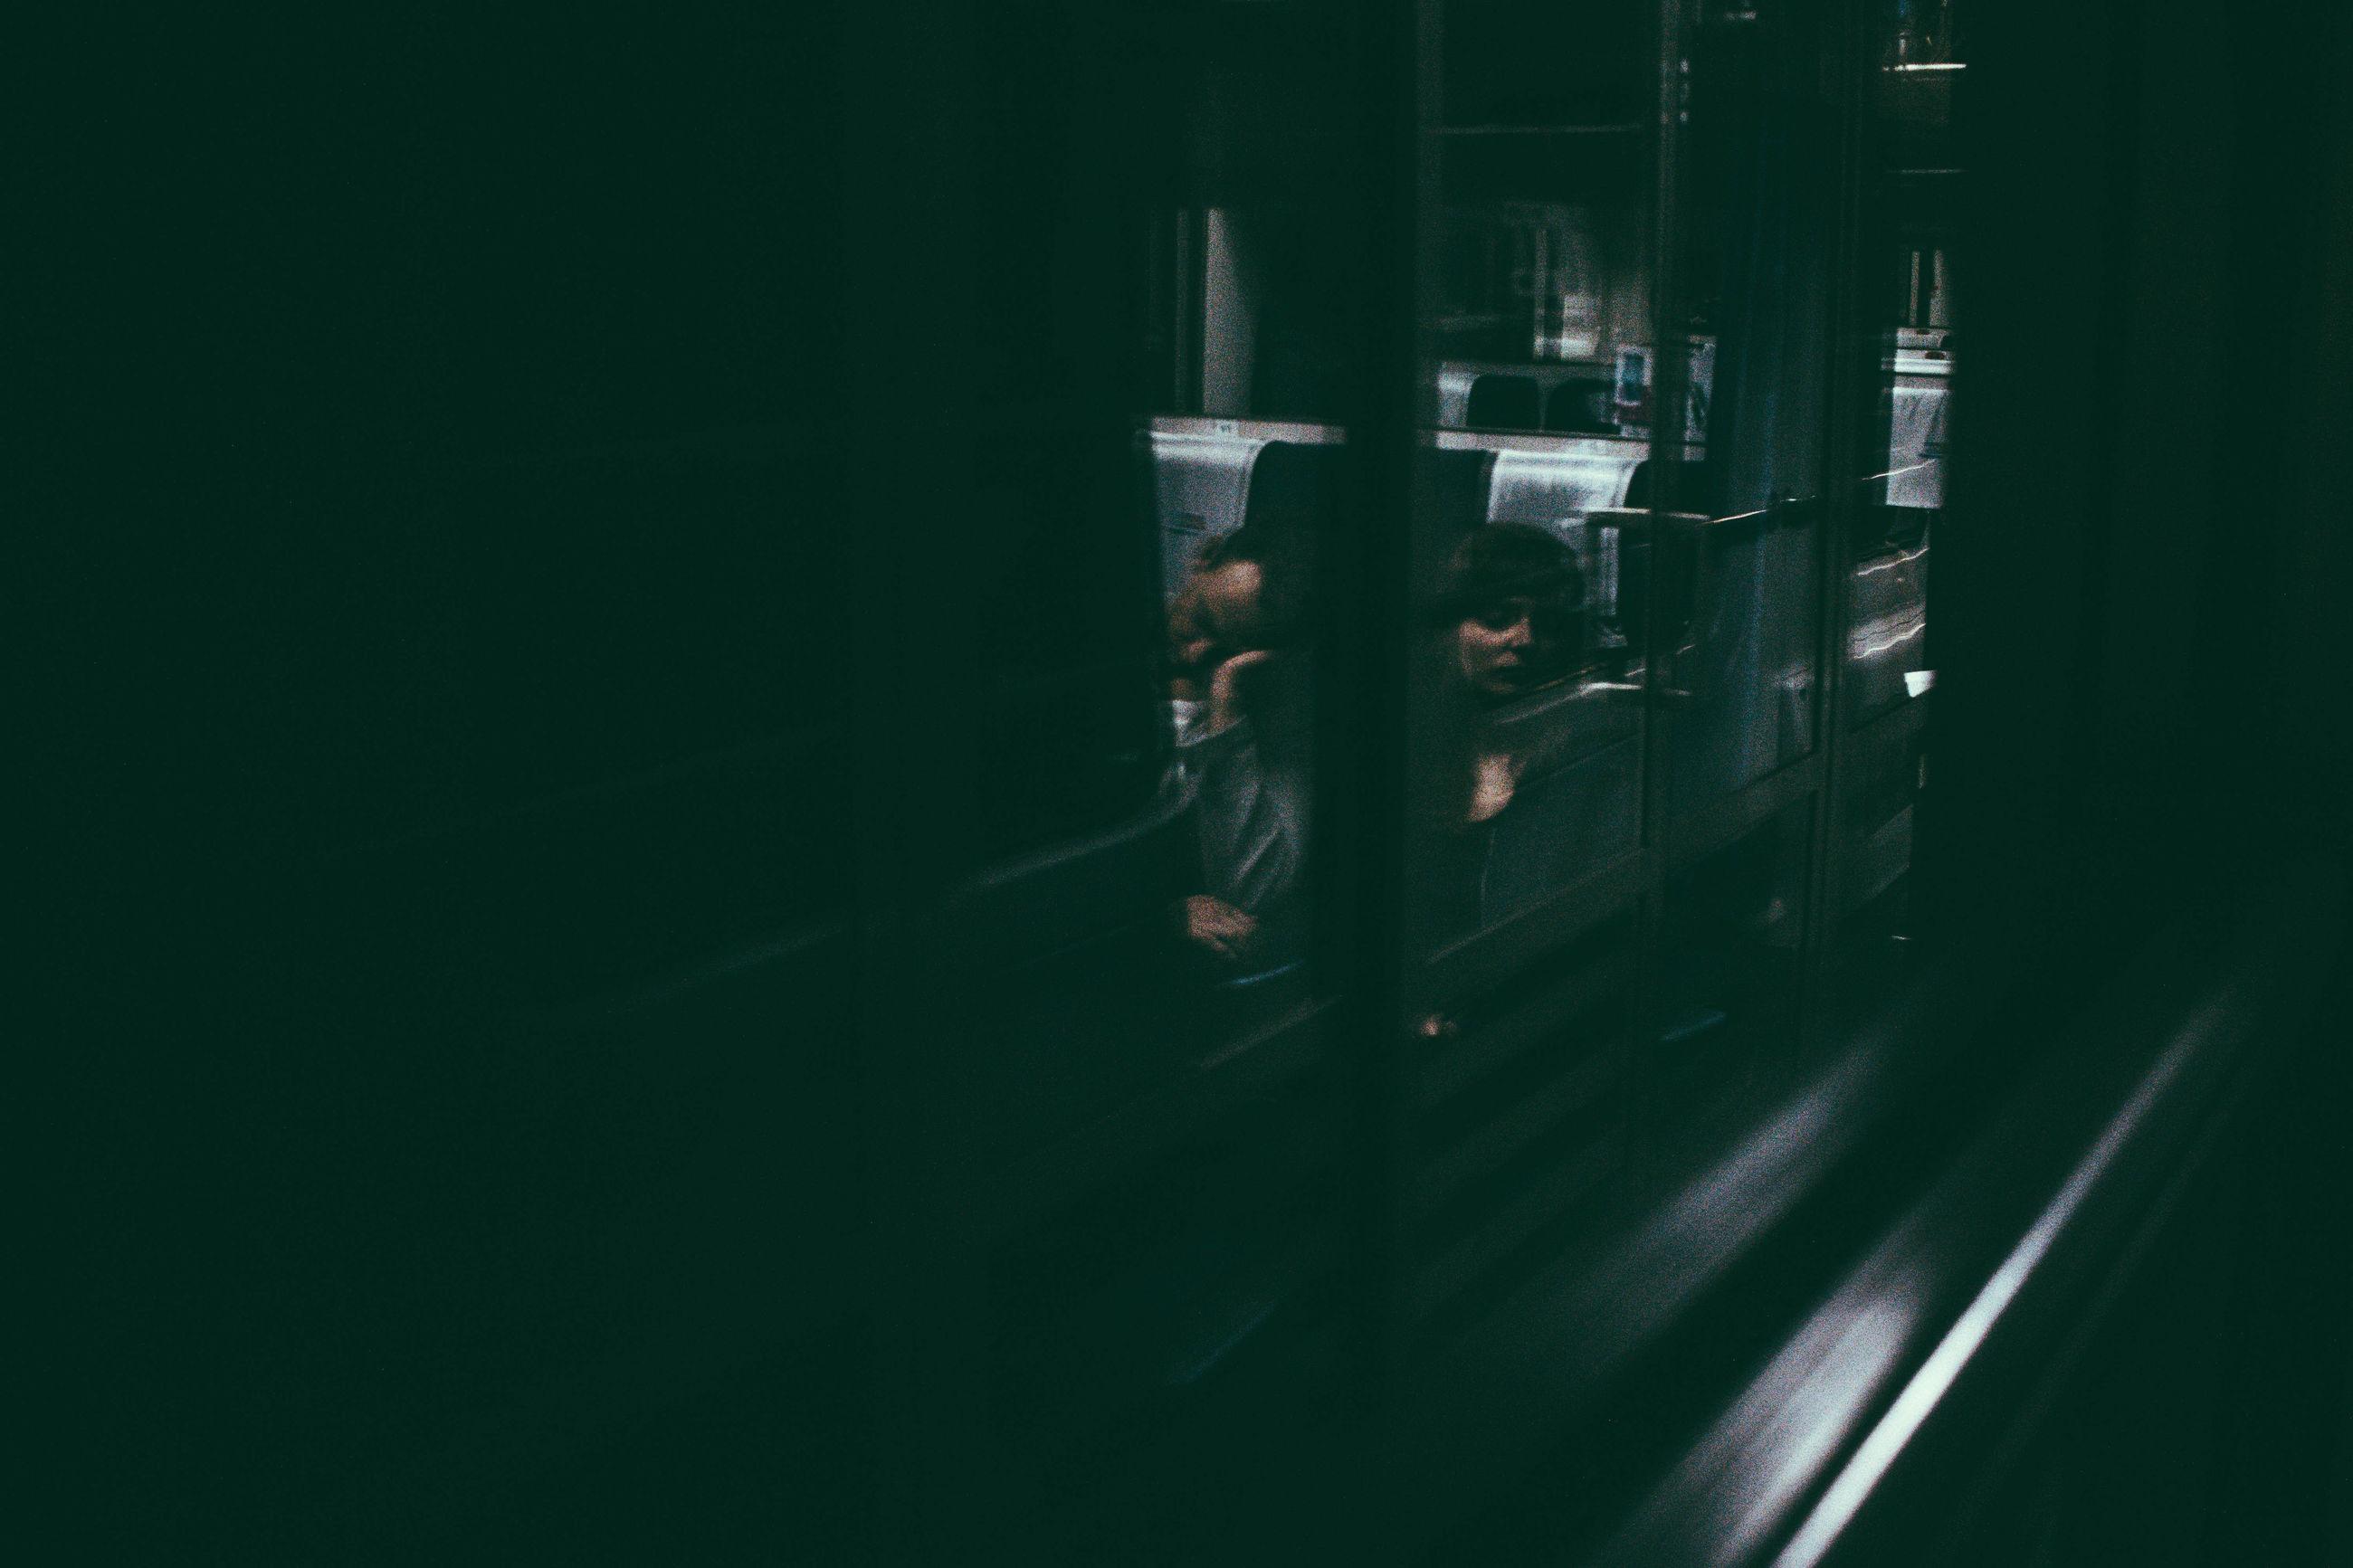 night, dark, illuminated, no people, plant, growth, nature, close-up, vignette